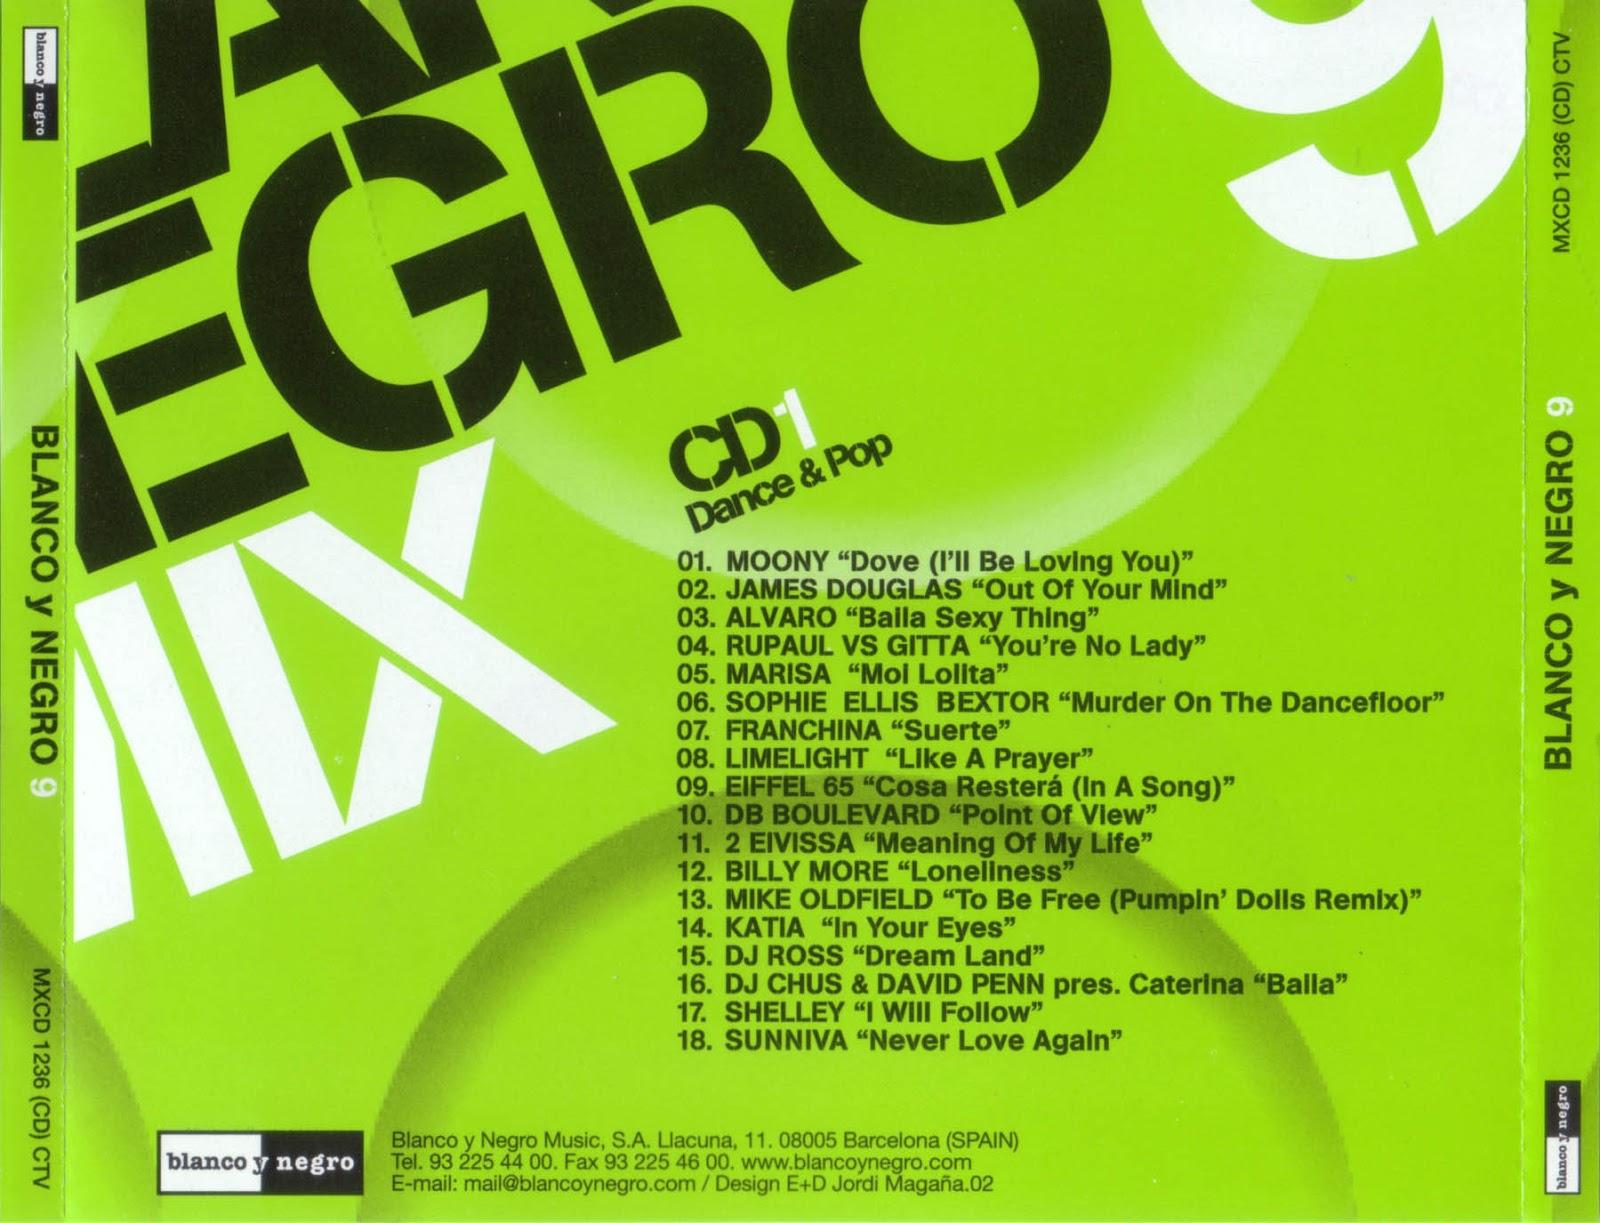 Dance Of The 90 S Blanco Y Negro Mix 9